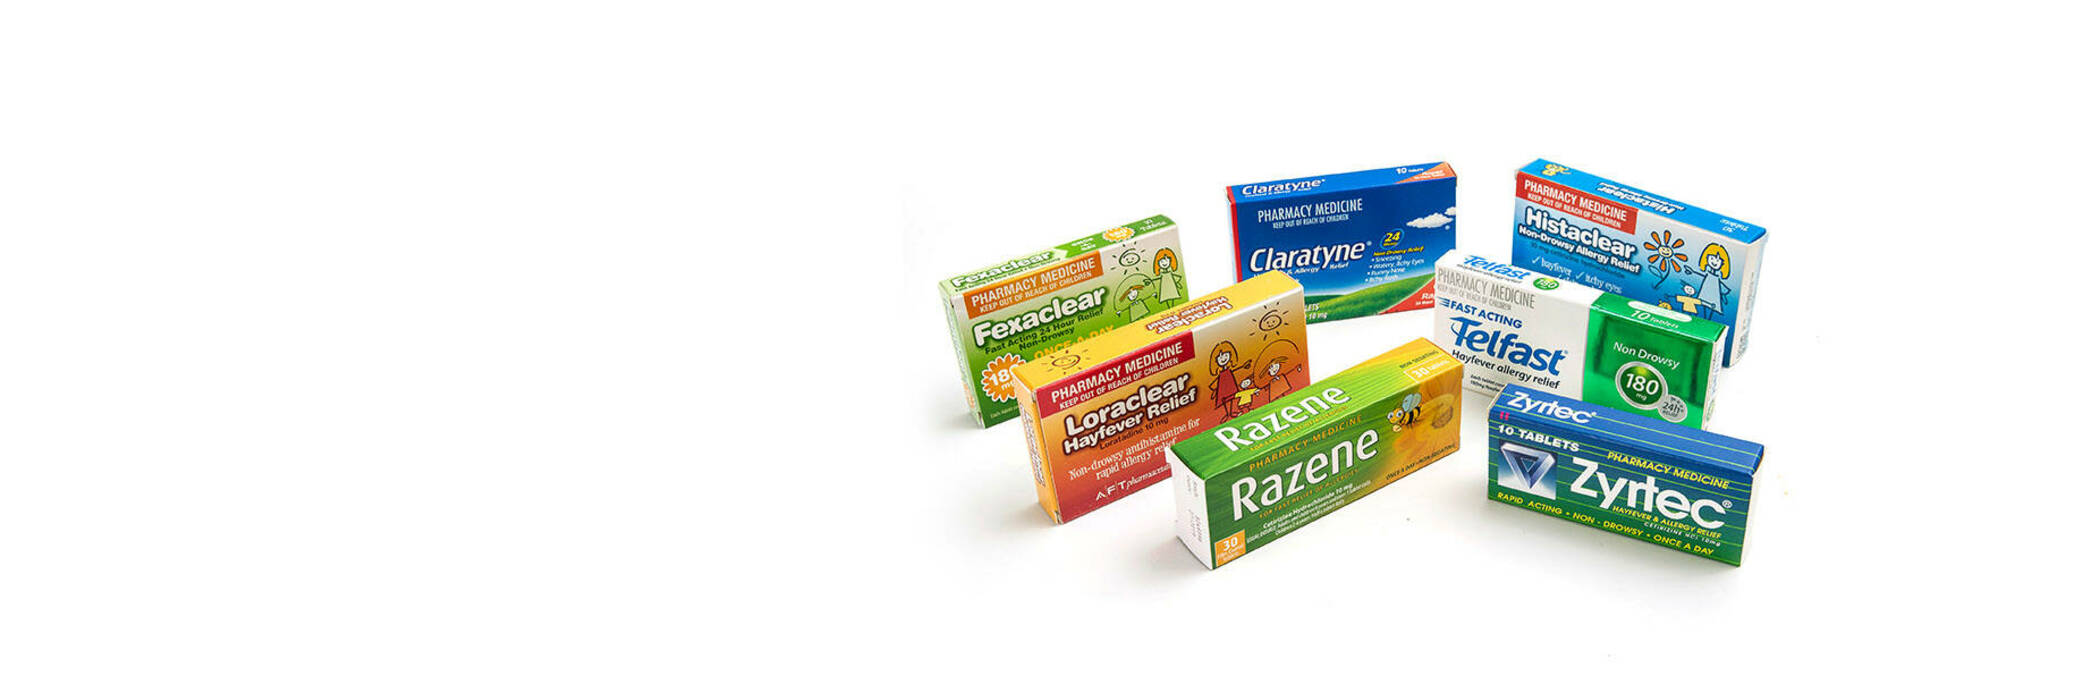 antihistamine products